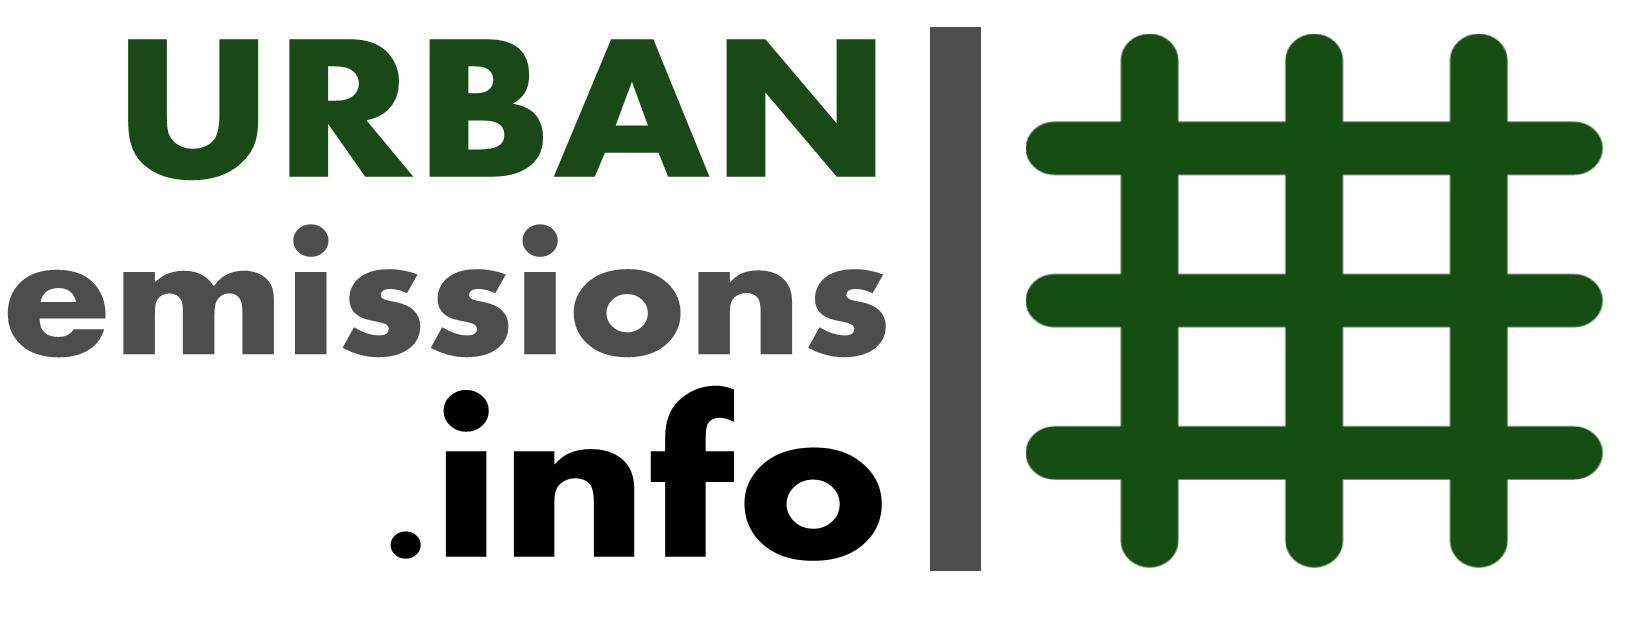 urbanemissions.png